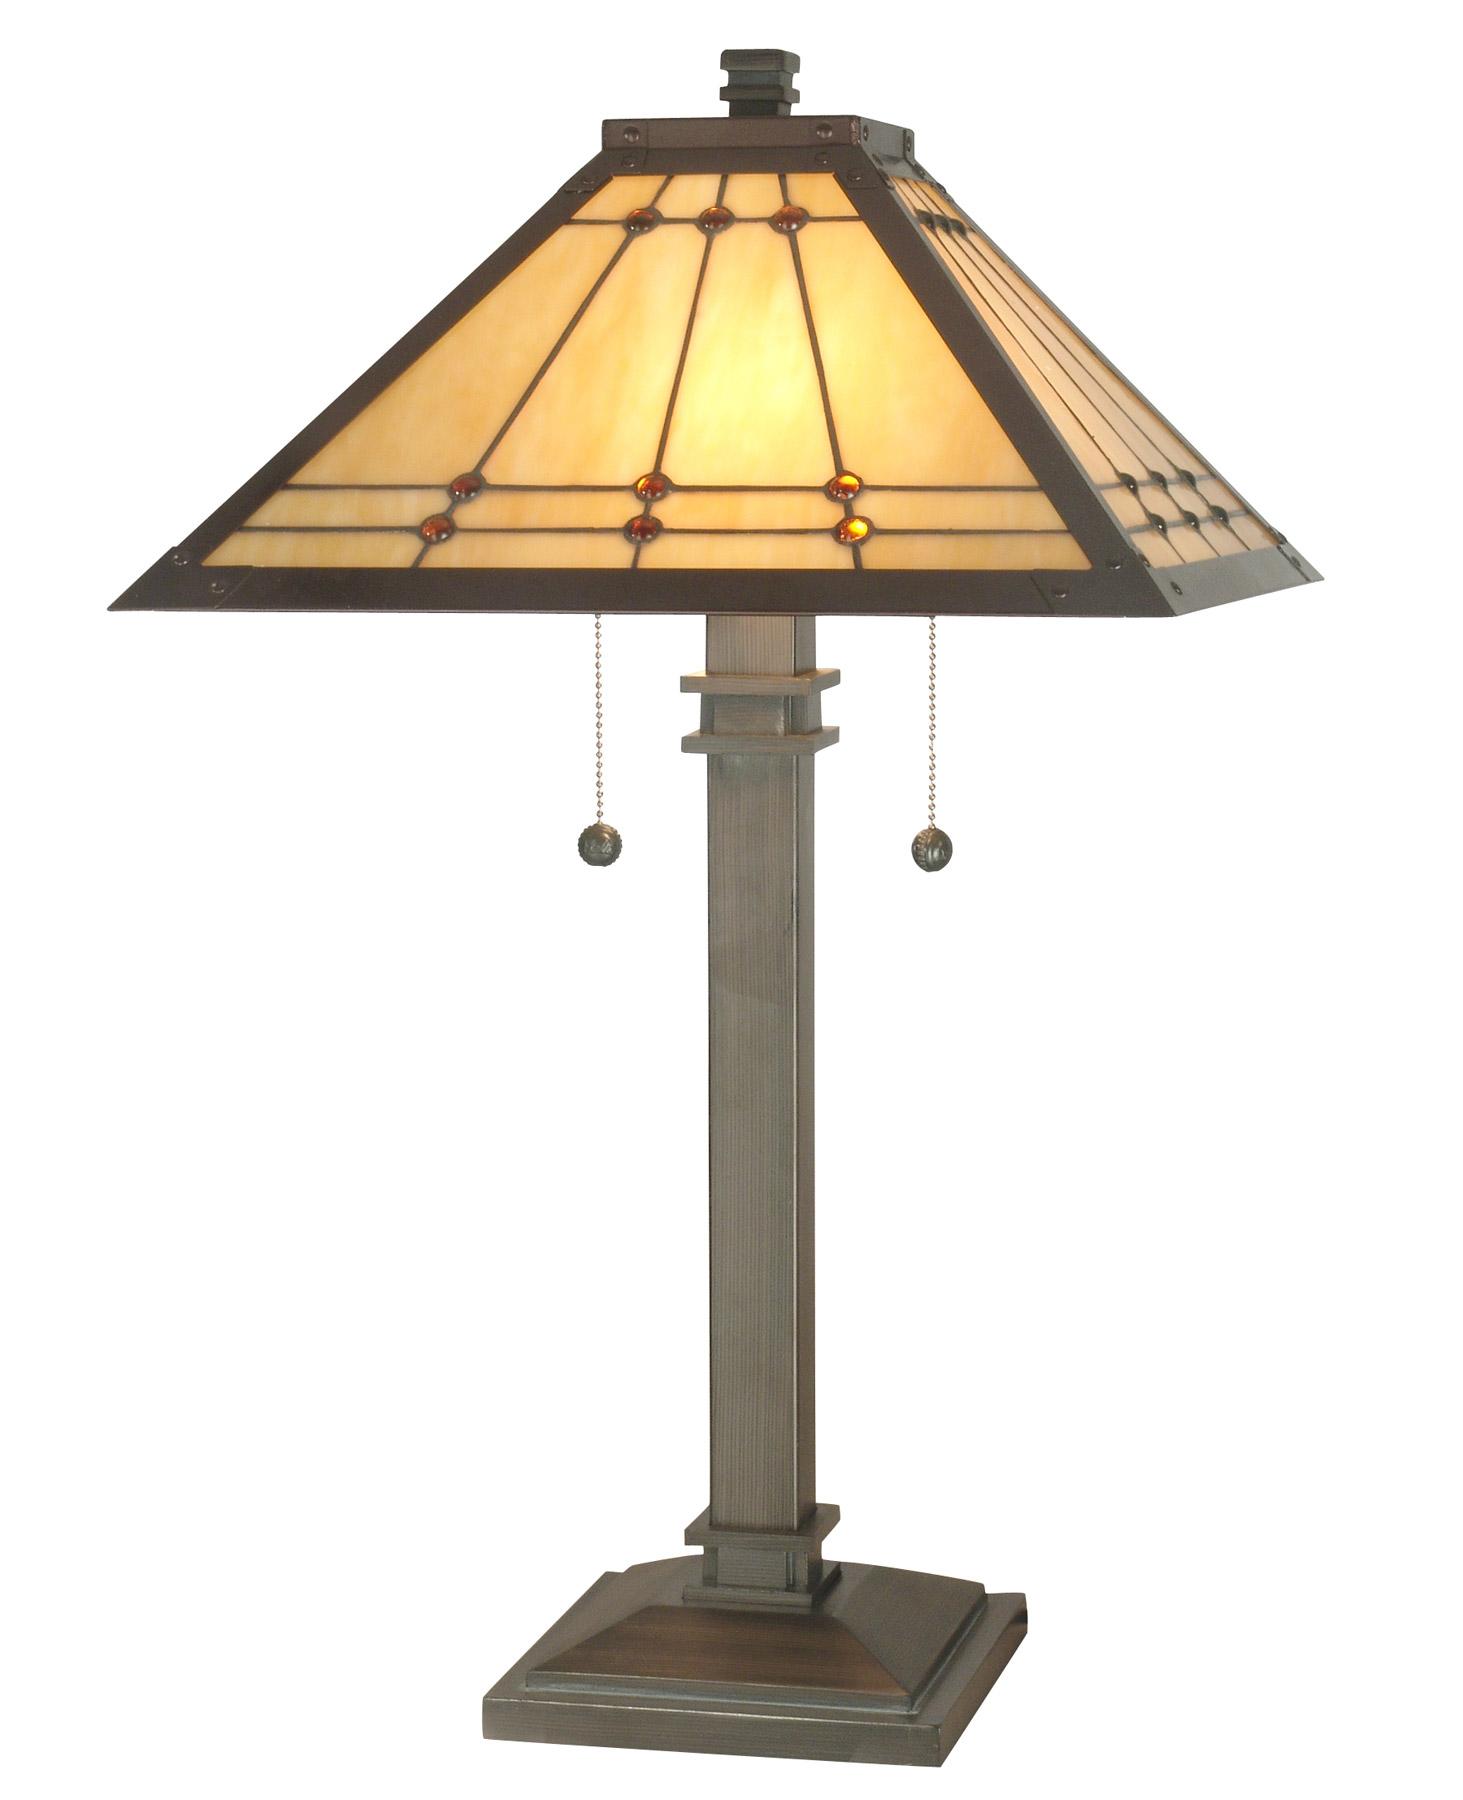 Dale Tiffany Tt70734 Craftsman Jeweled Mission Table Lamp